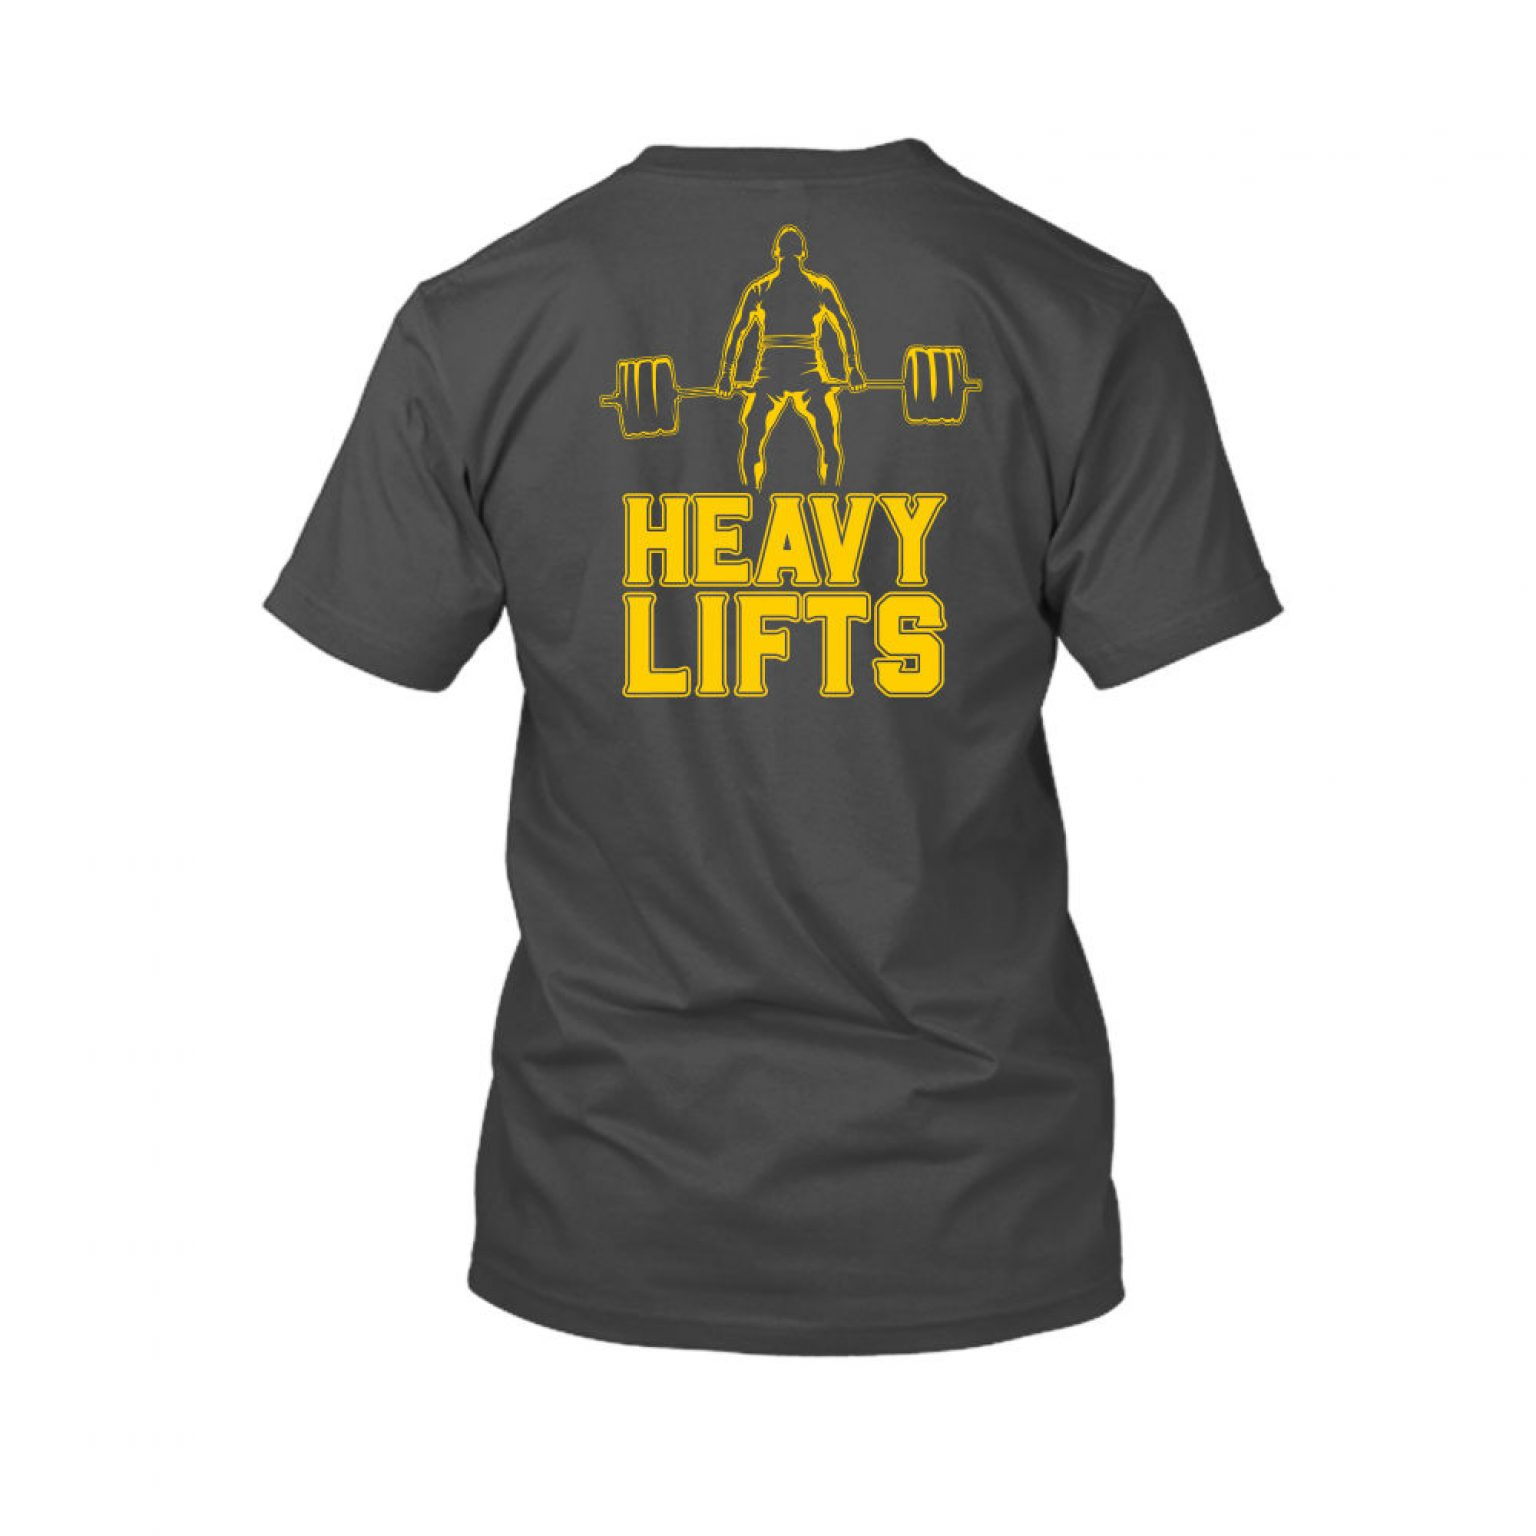 heavylifts shirt herren charcoal back